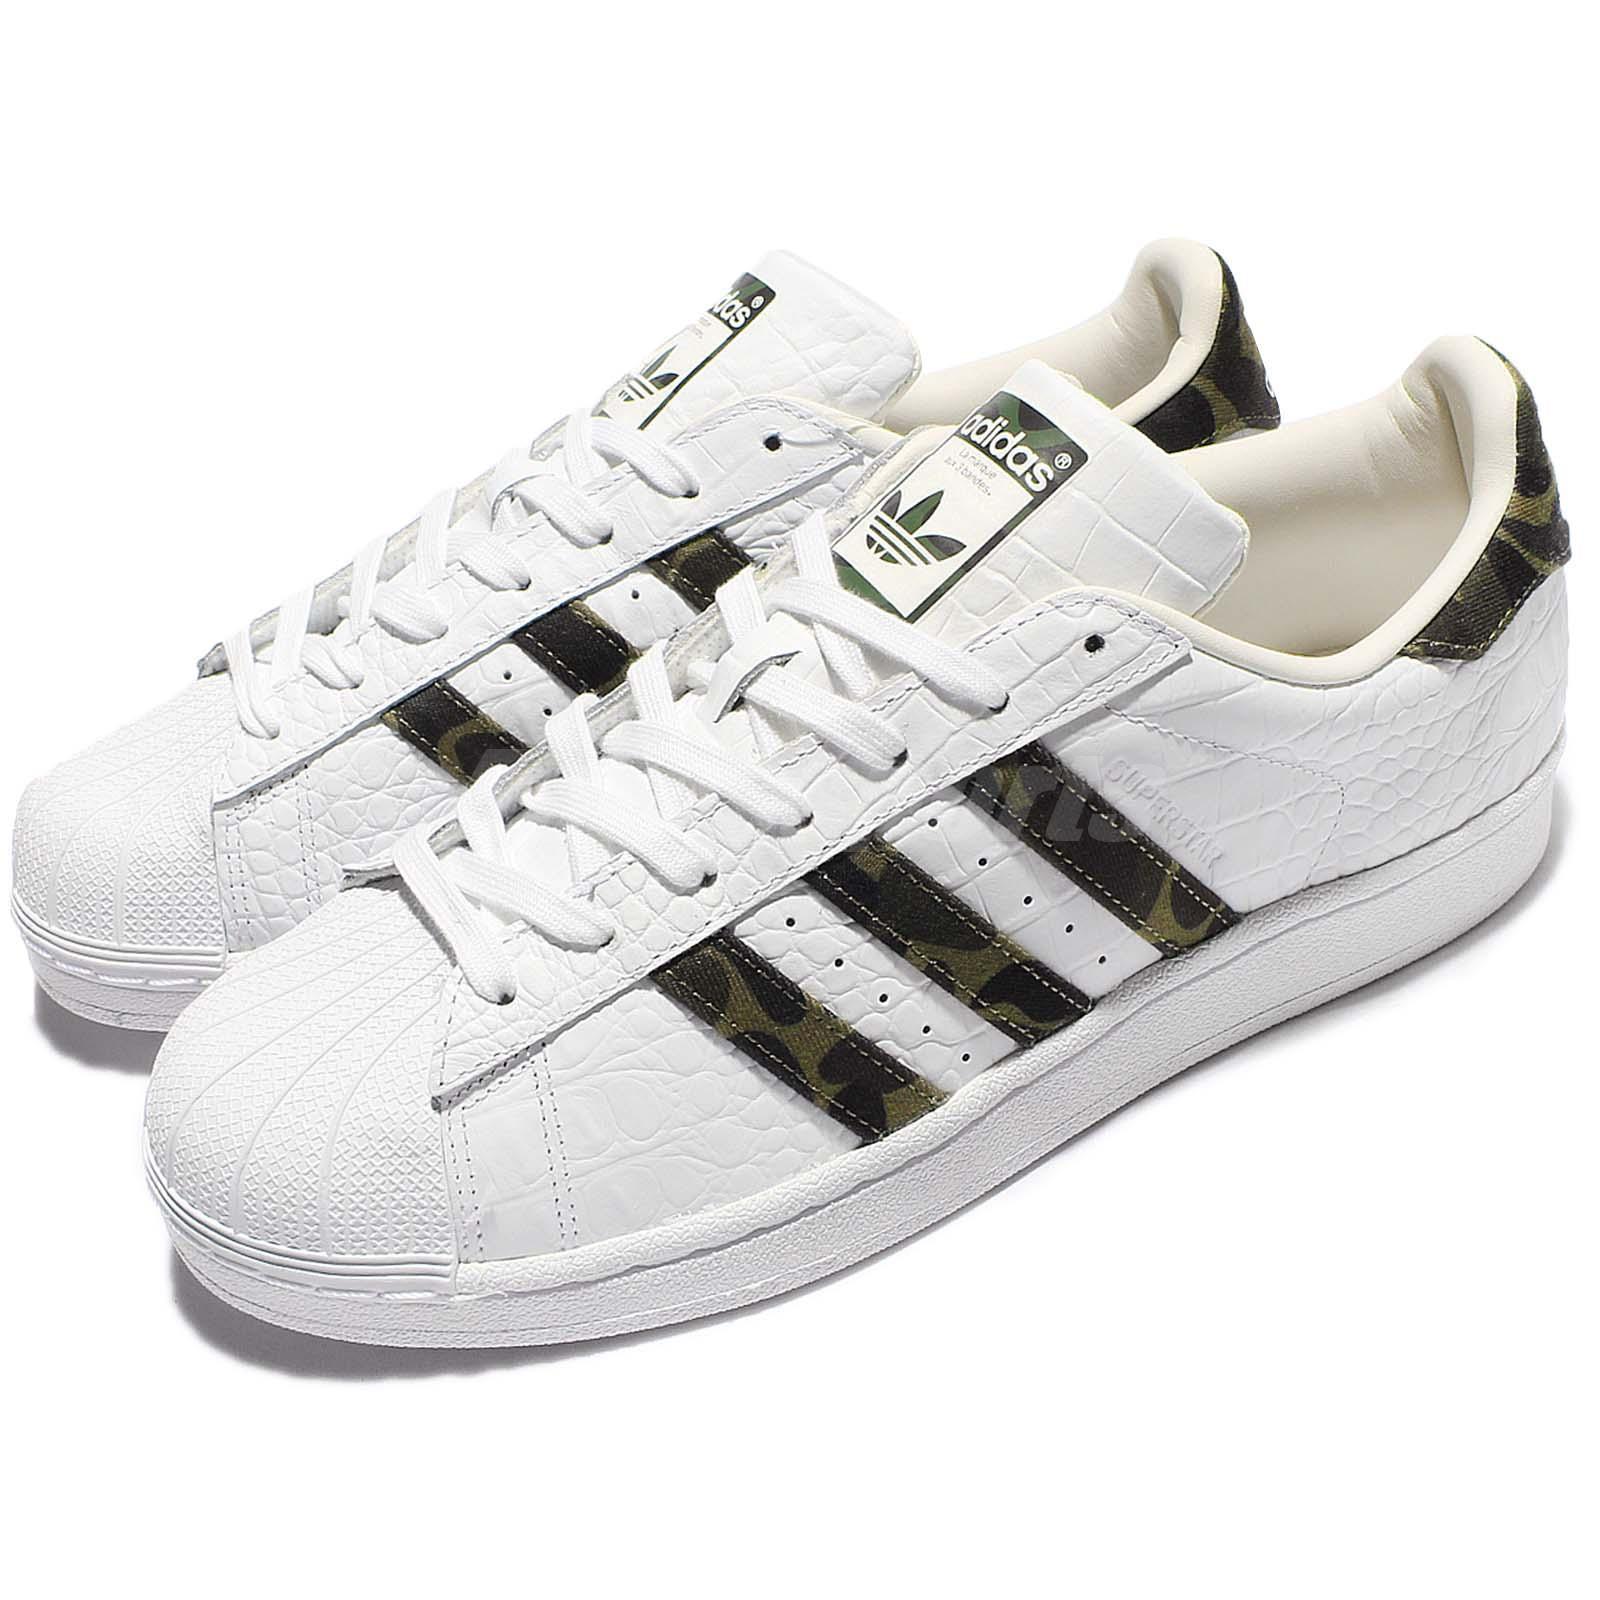 Adidas Camouflage Shoes Indonesia